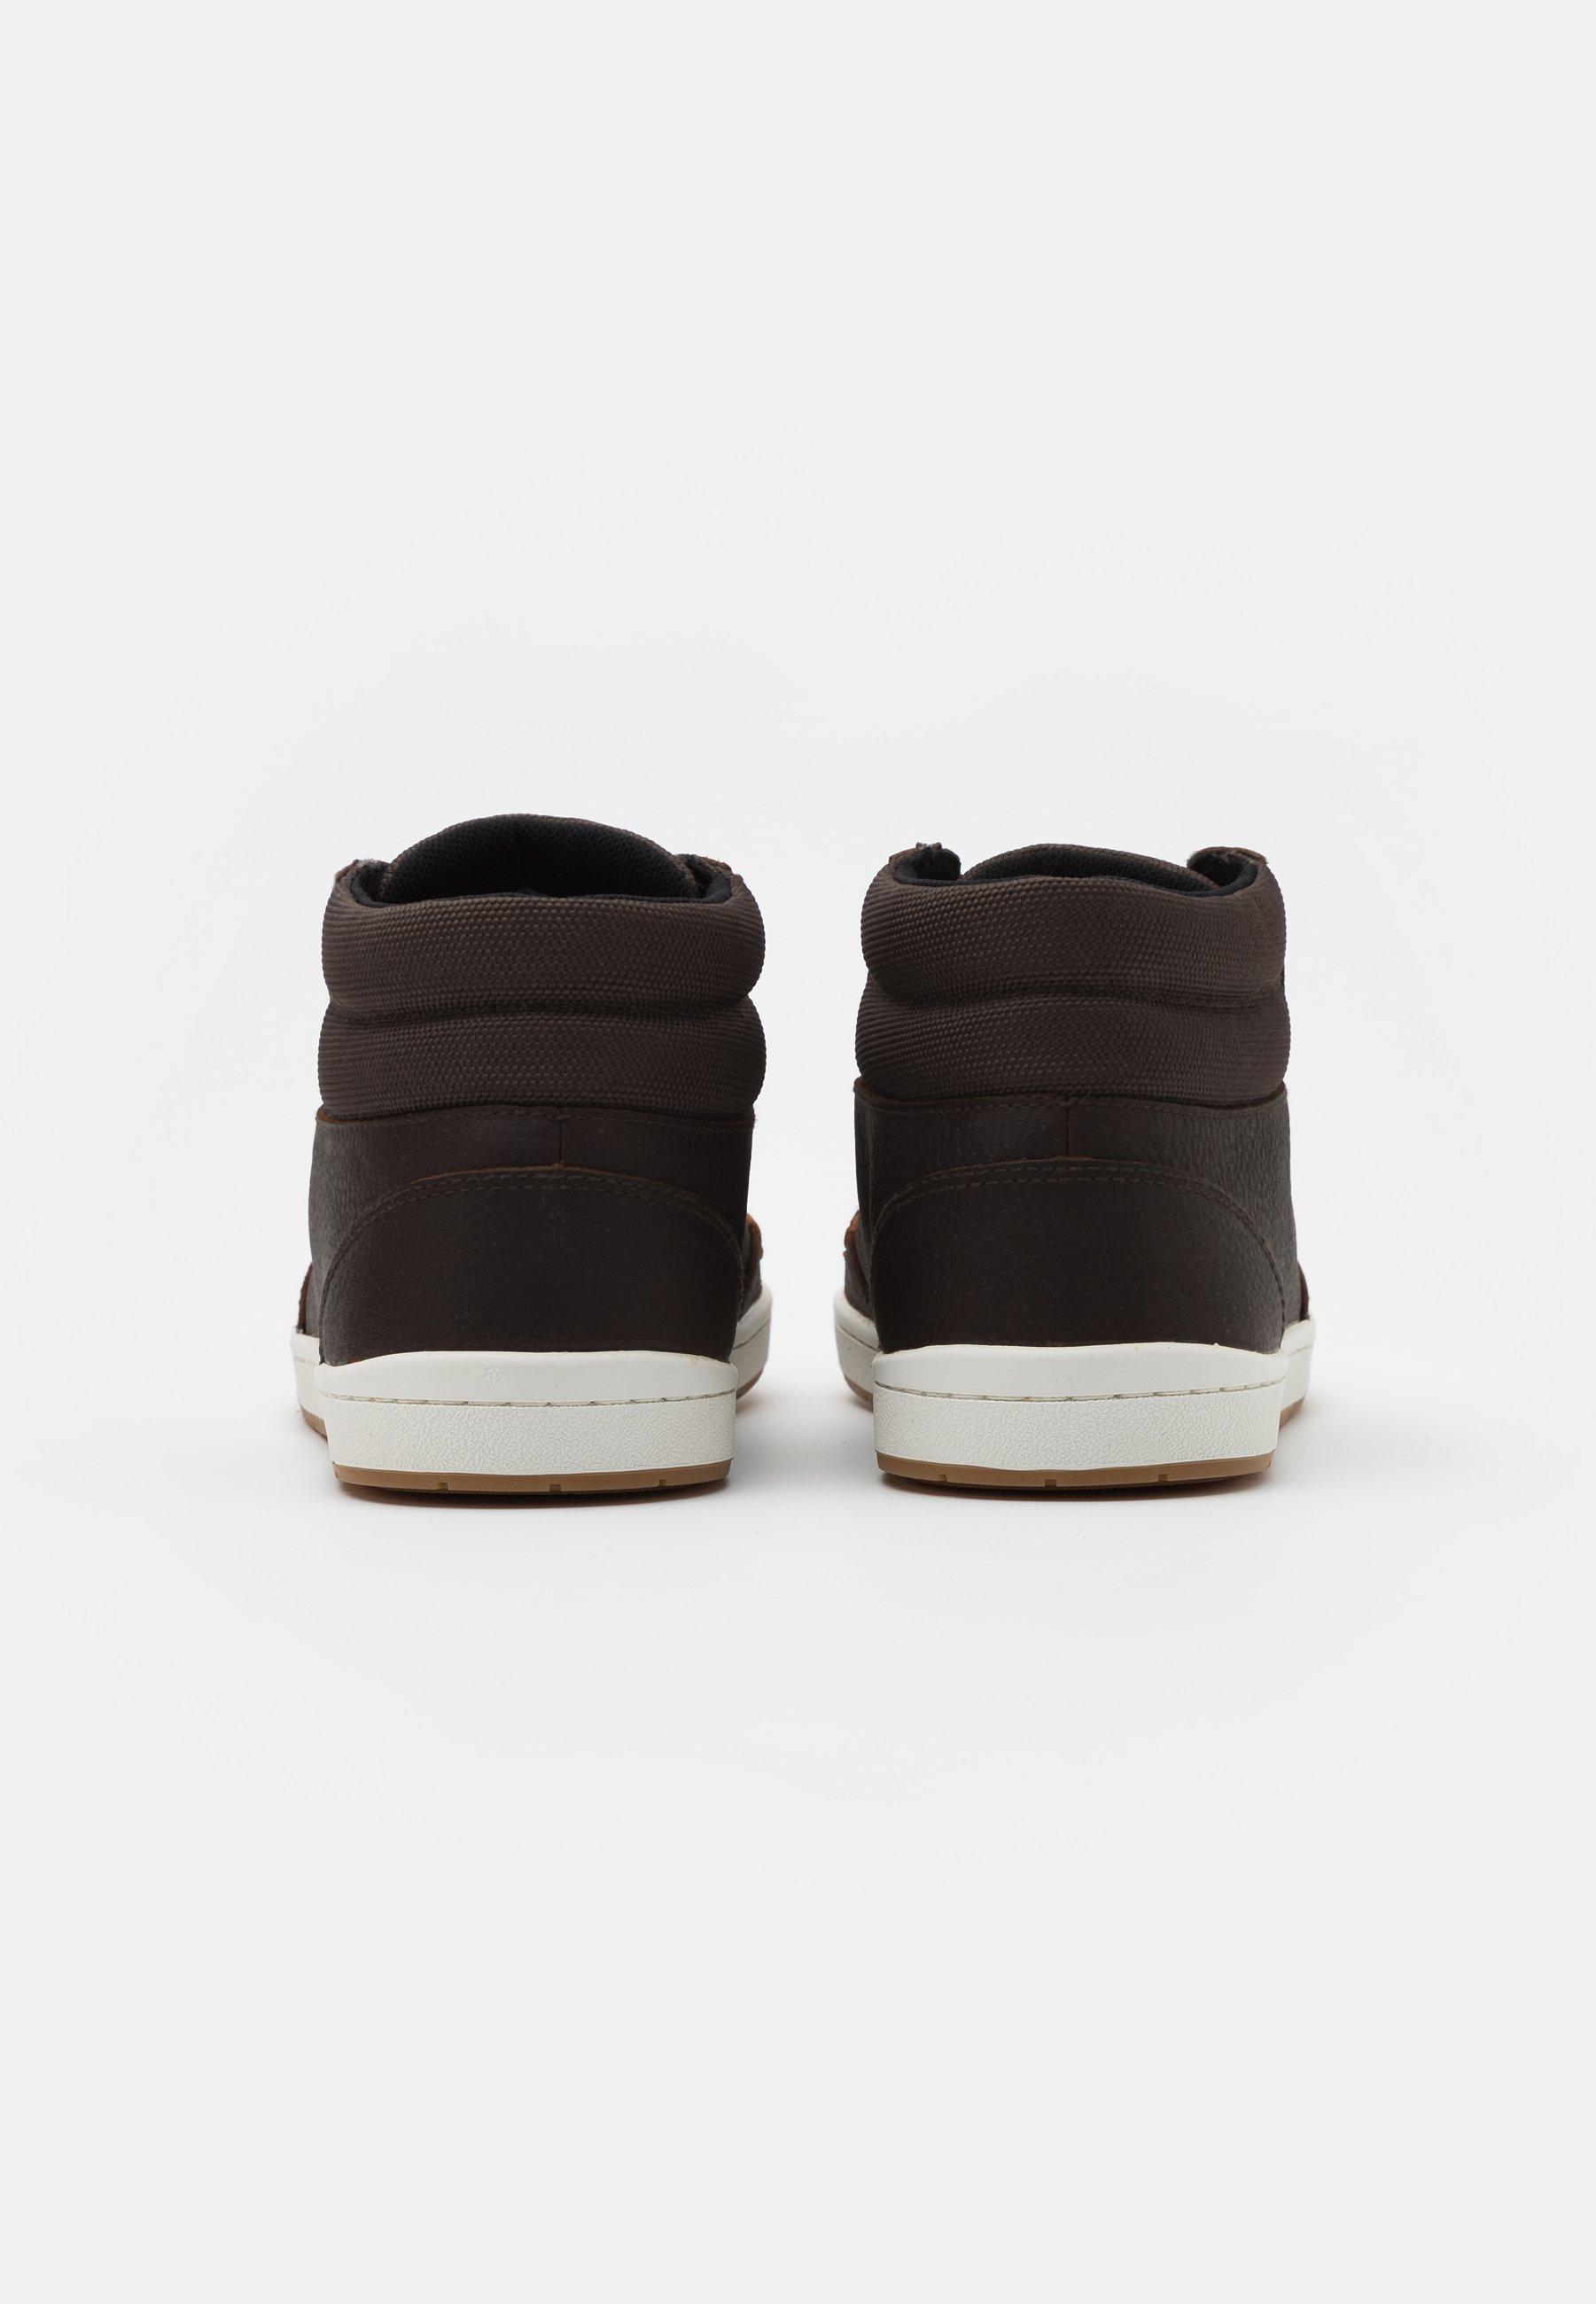 HUB INDUSTRY - Sneaker high - dark brown/offwhite/braun - Herrenschuhe yI3k7